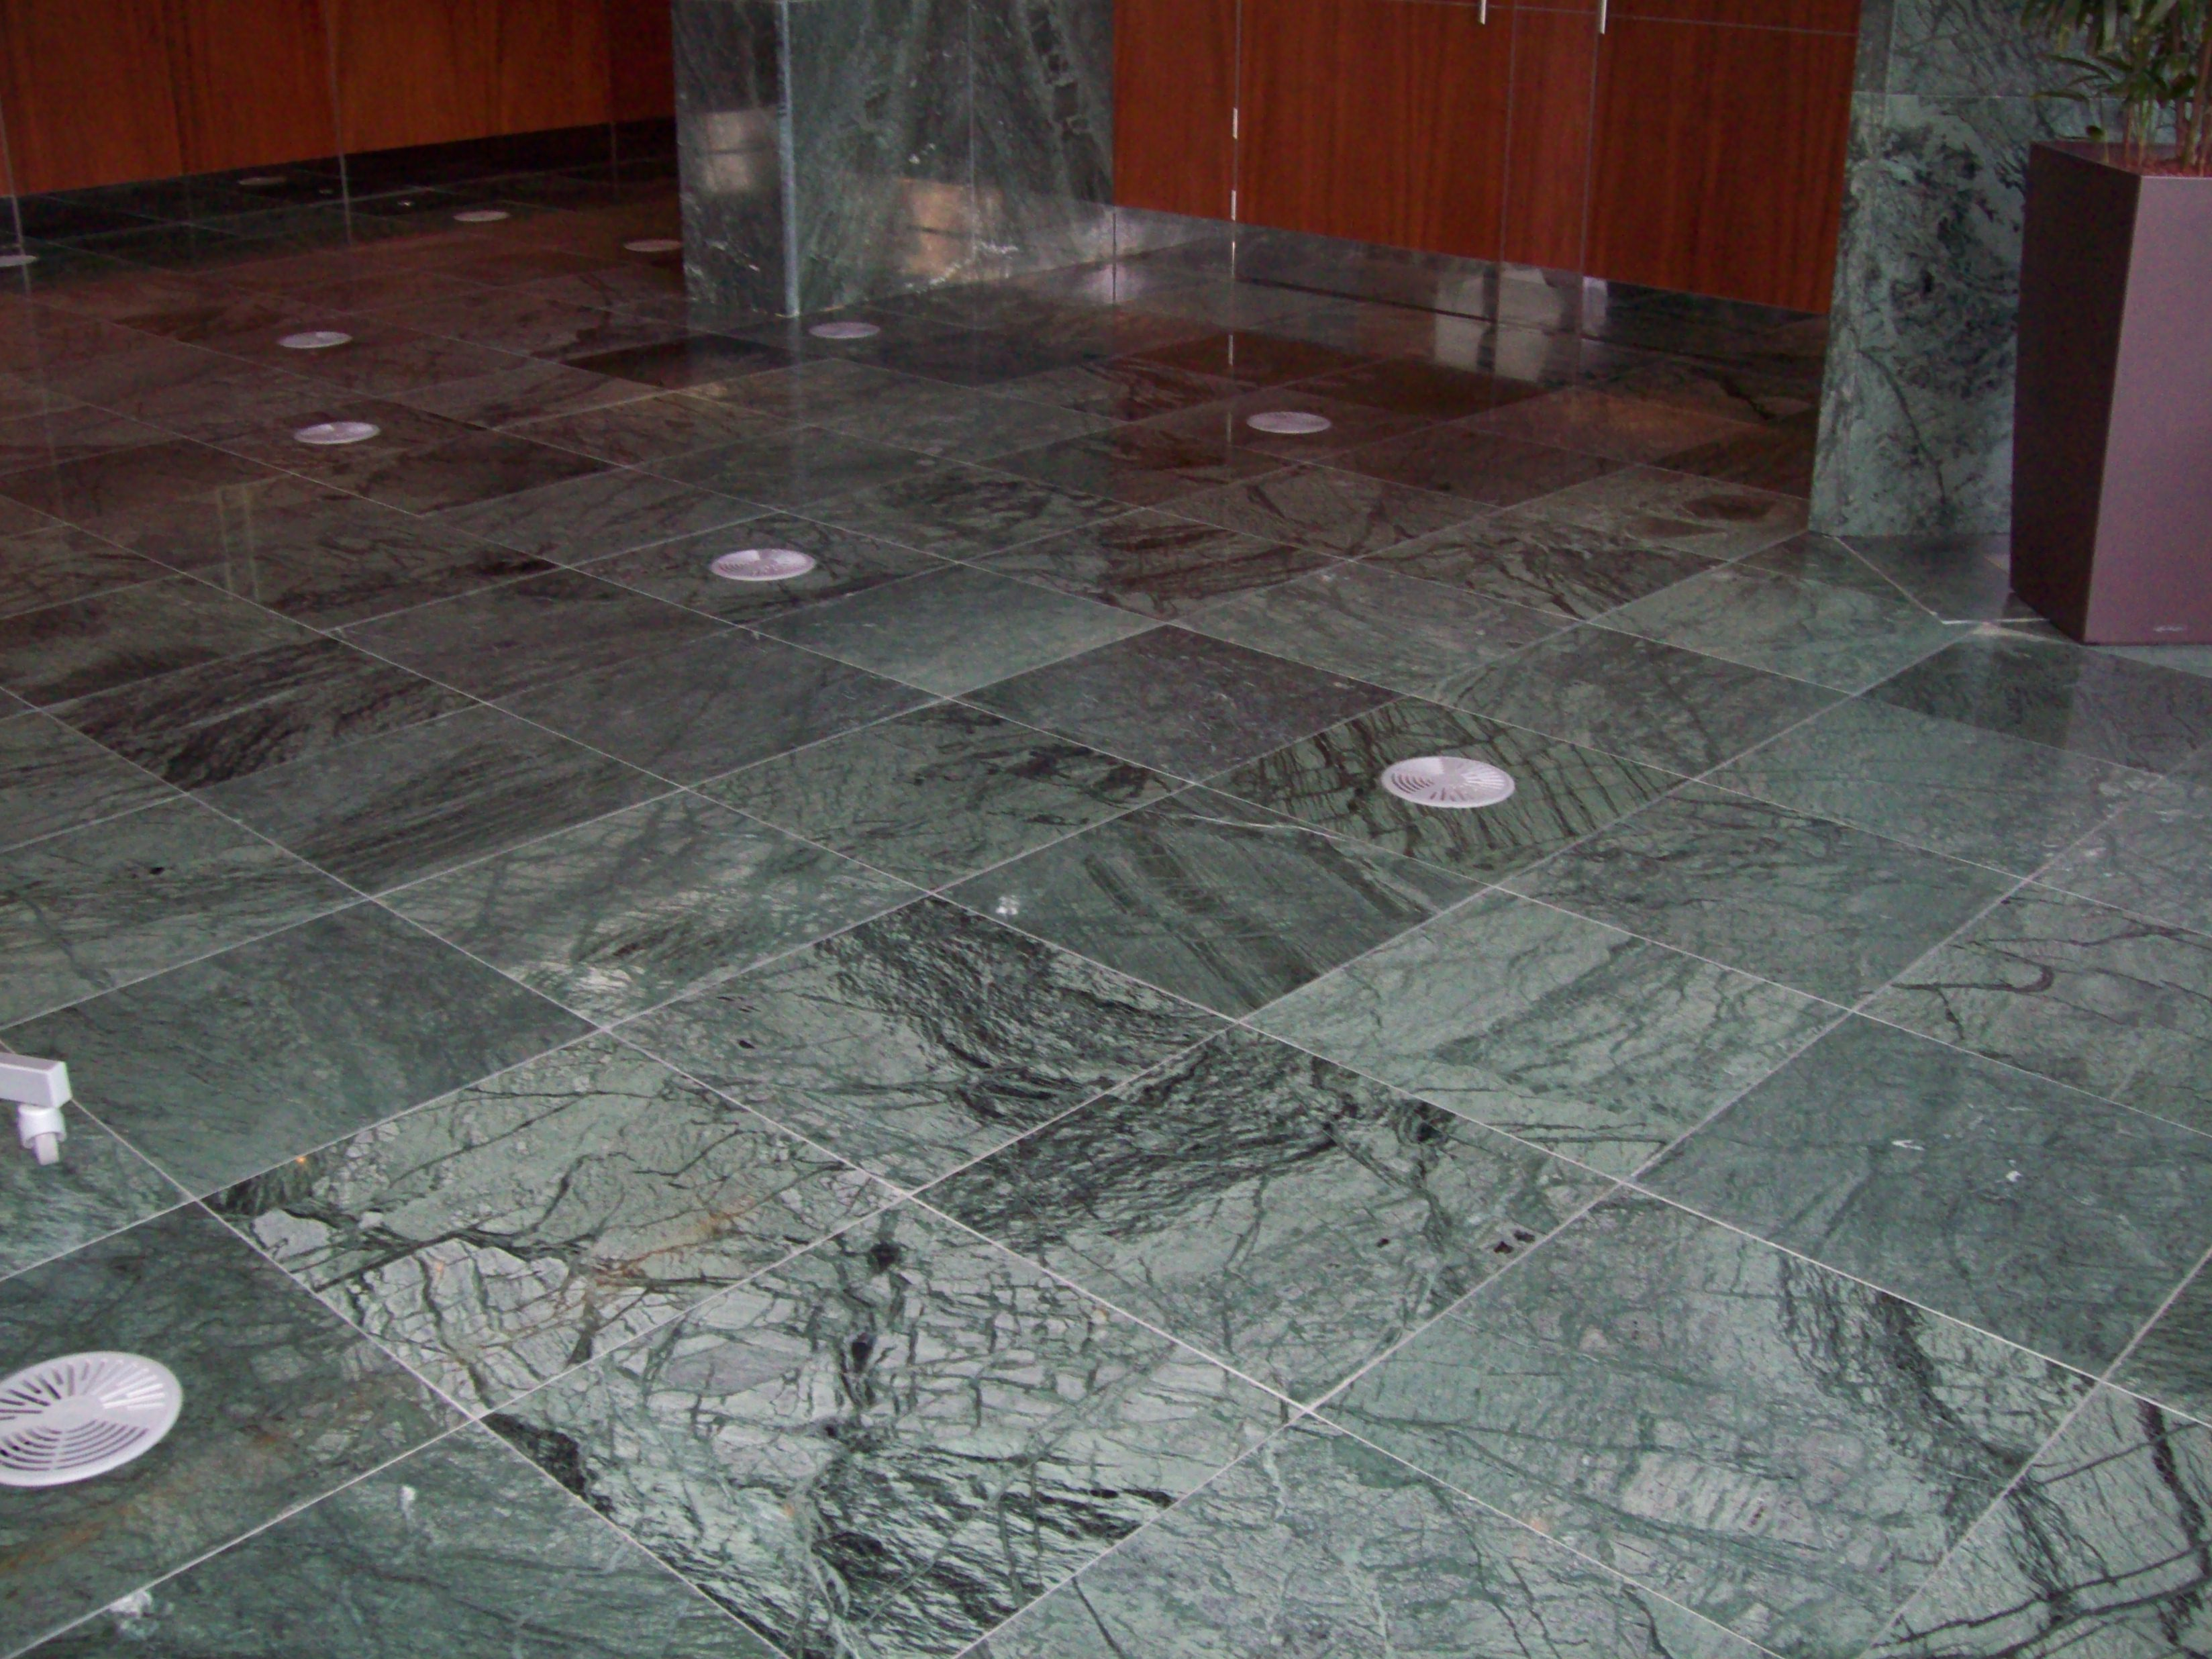 SAB MARMO 012 State Audit Bureau: pavimenti sopraelevati Nesite anche in Kuwait